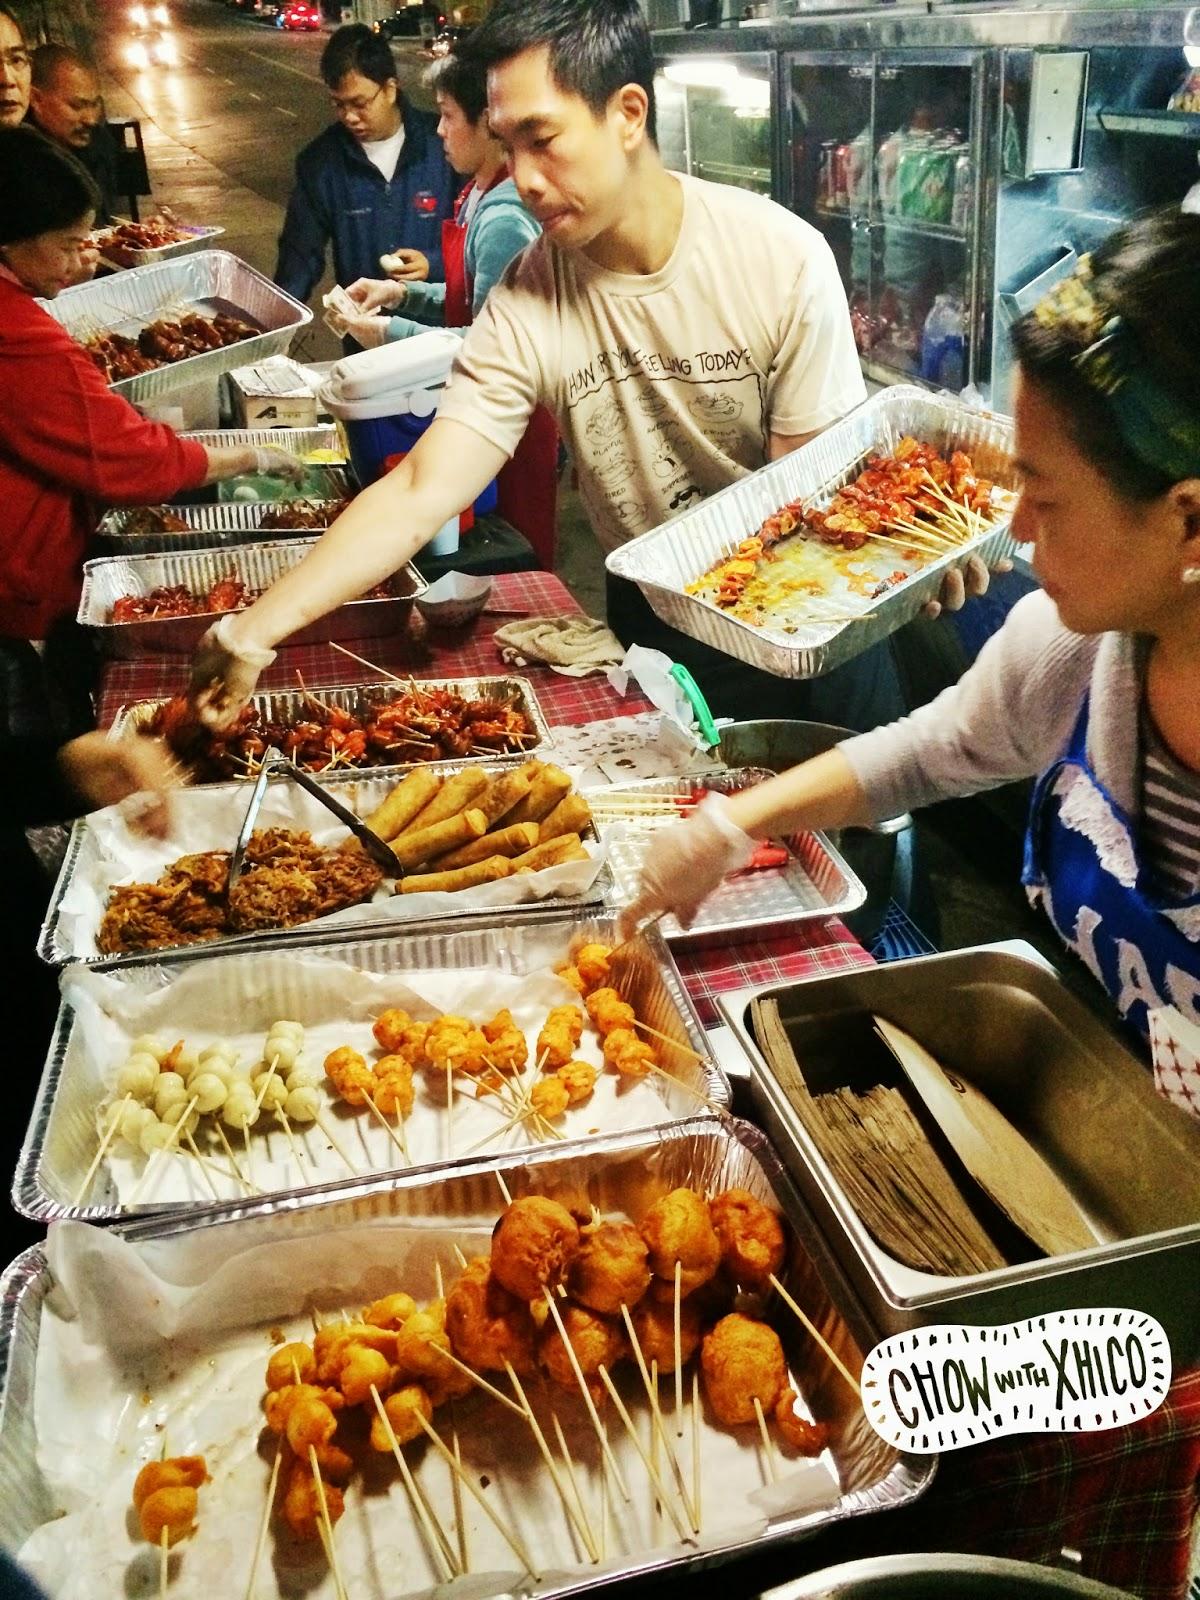 filipino food Philippine food blog best list keep up with filipino recipes, filipino food culture, filipino dishes, filipino cuisine, filipino restaurants, filipino food blogs by following top filipino food site.